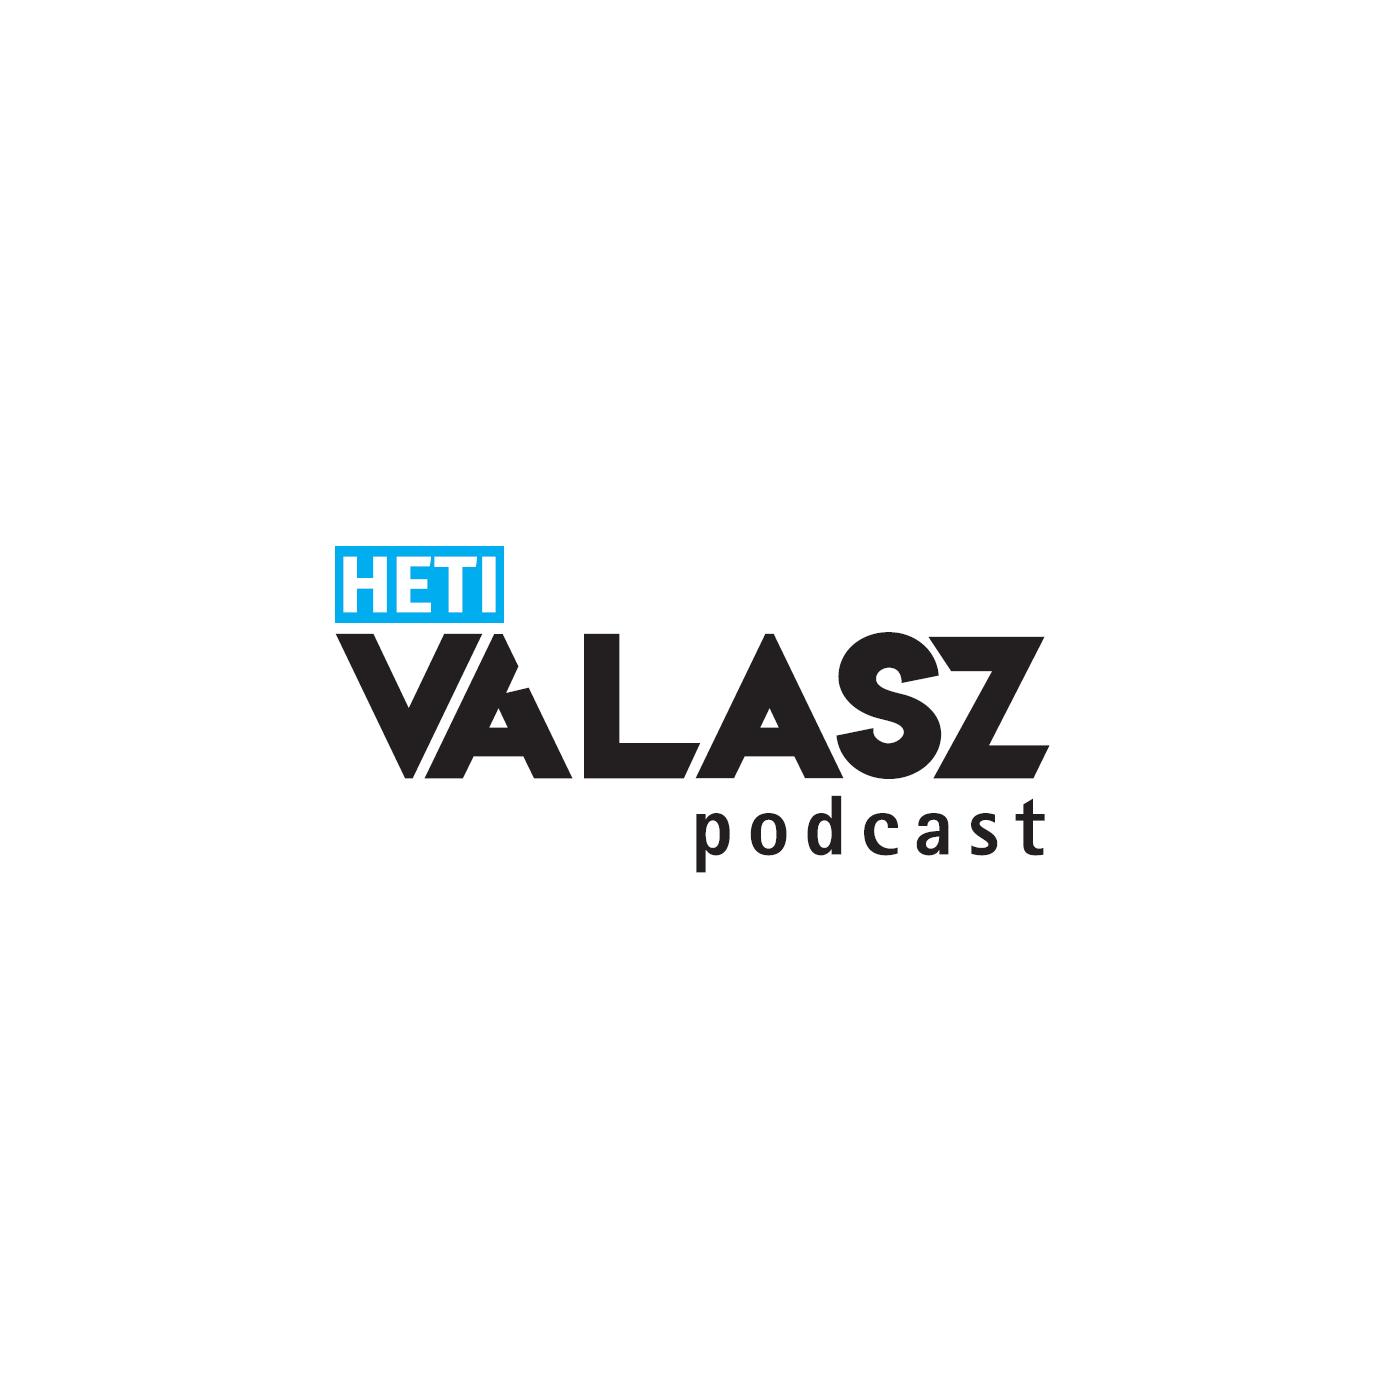 hetivalasz's podcast show art